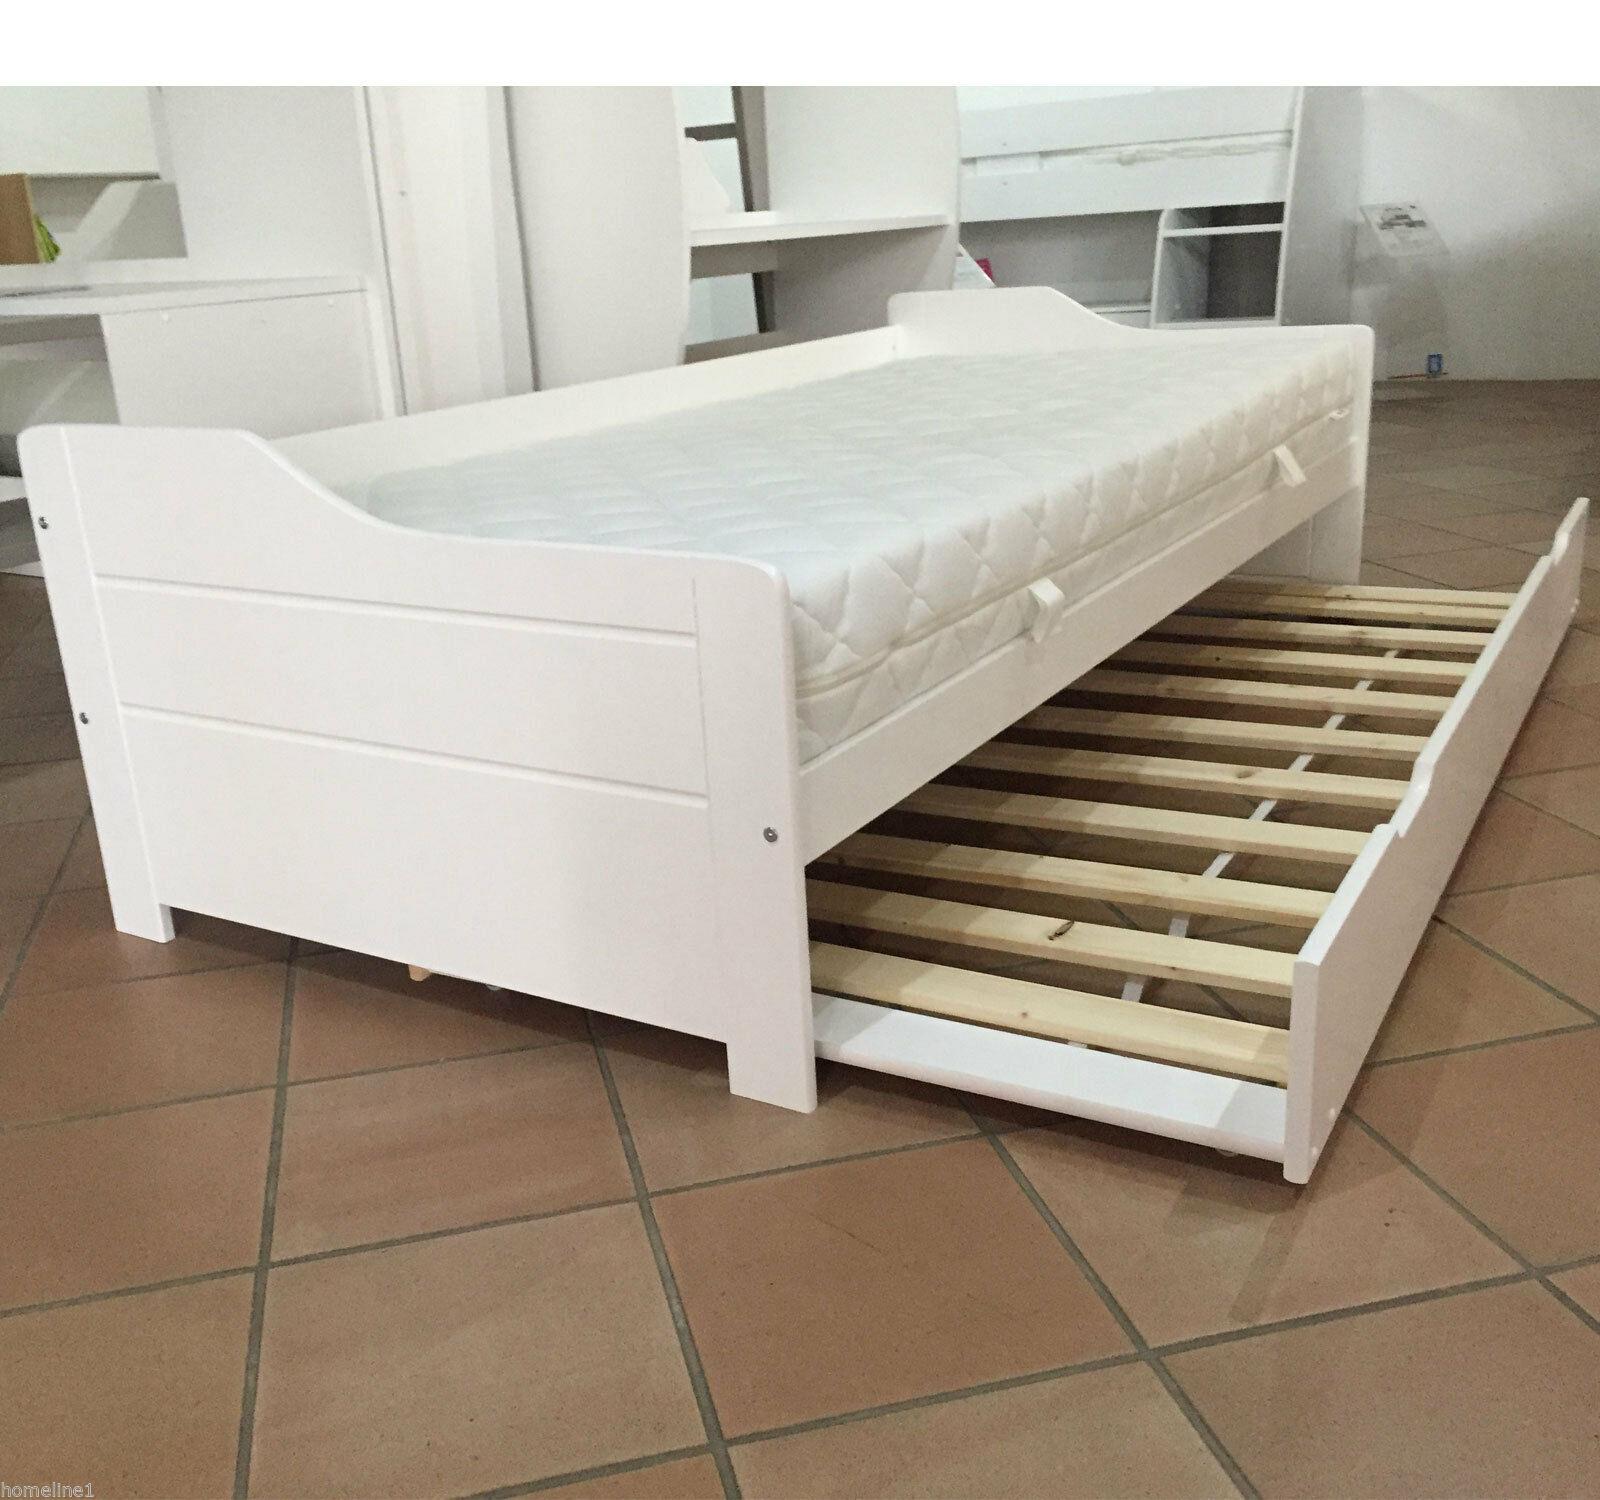 Full Size of Betten 90x200 Bett Funktionsbett Massiv Weiss Klappbett Gstebett 140x200 Weiß Amerikanische Massivholz 200x220 120x200 Designer Musterring Kaufen Luxus Bett Betten 90x200